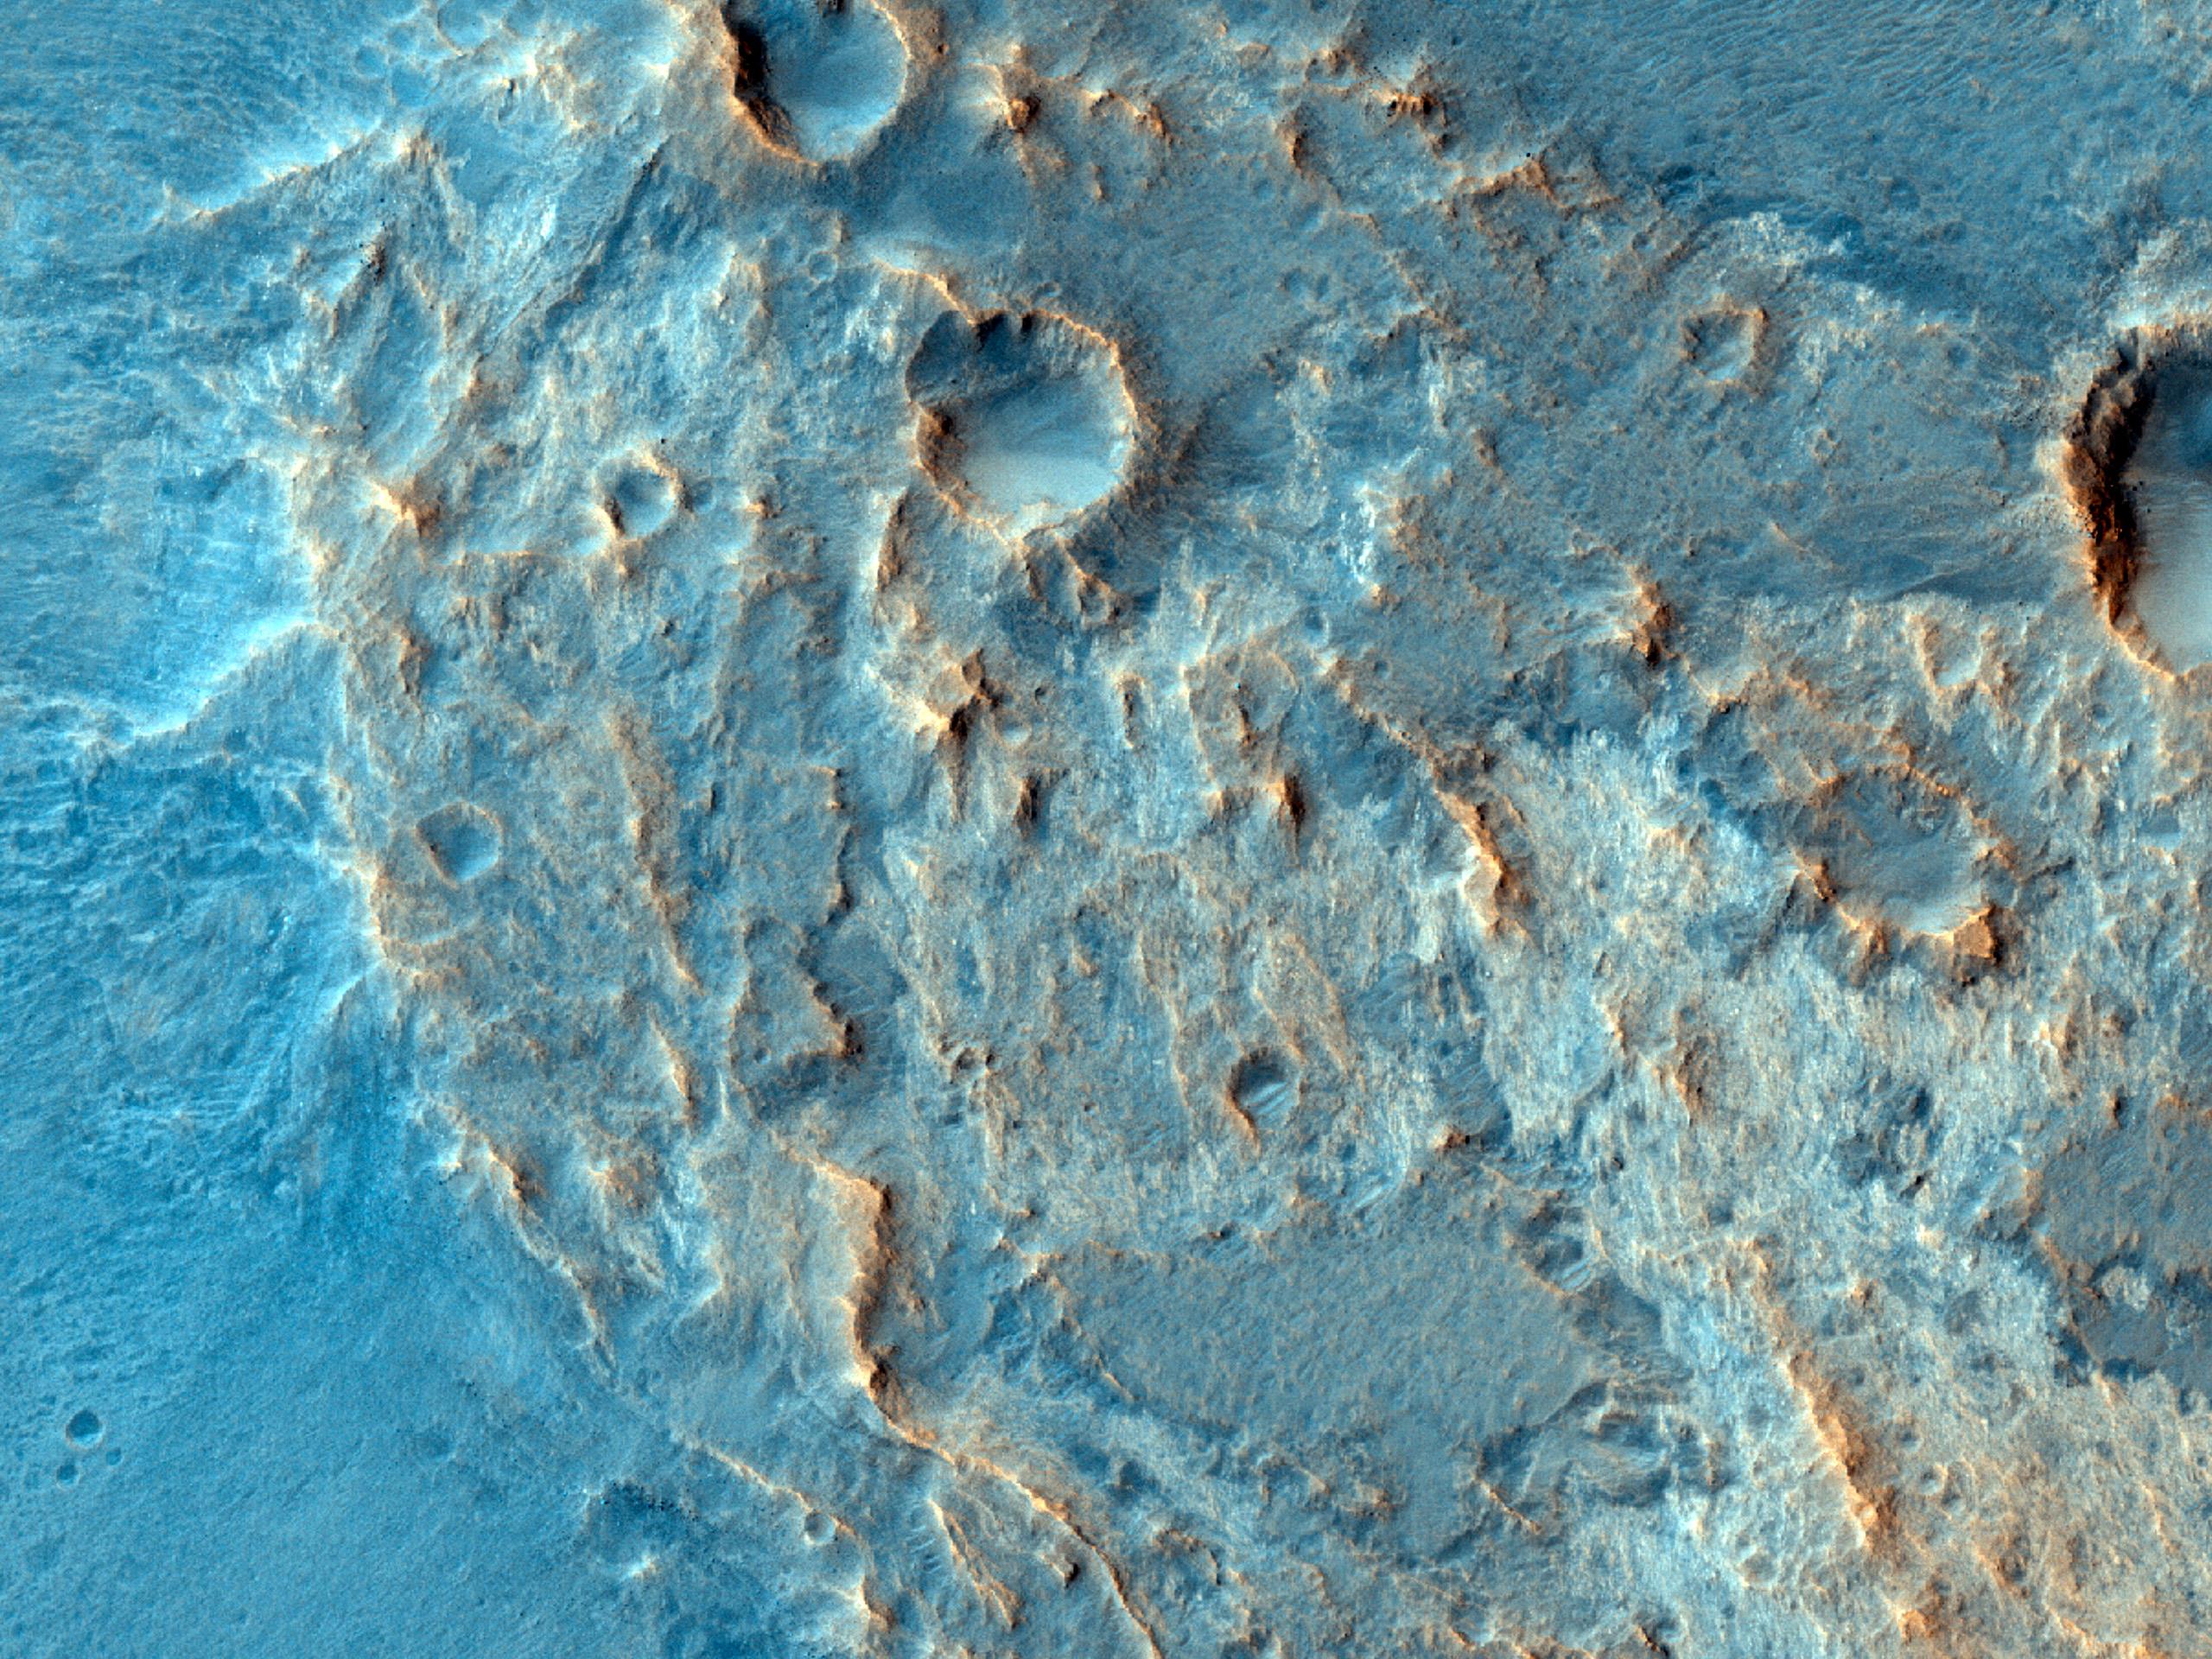 Afloramentos em Mawrth Vallis